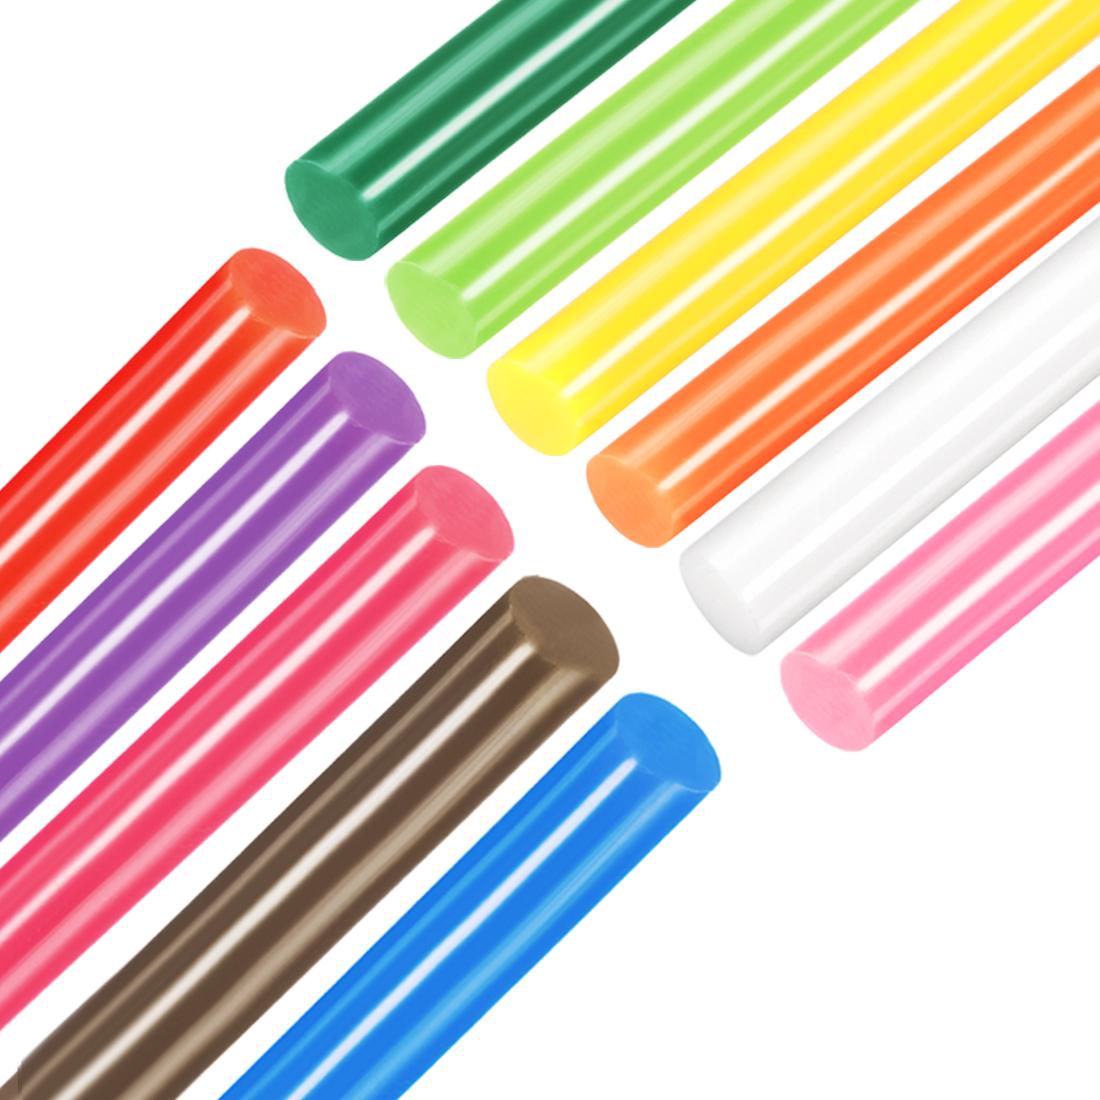 Colorful Hot Melt Glue Gun Sticks, 250mm x 7mm,Use with Most Glue Guns,11pcs